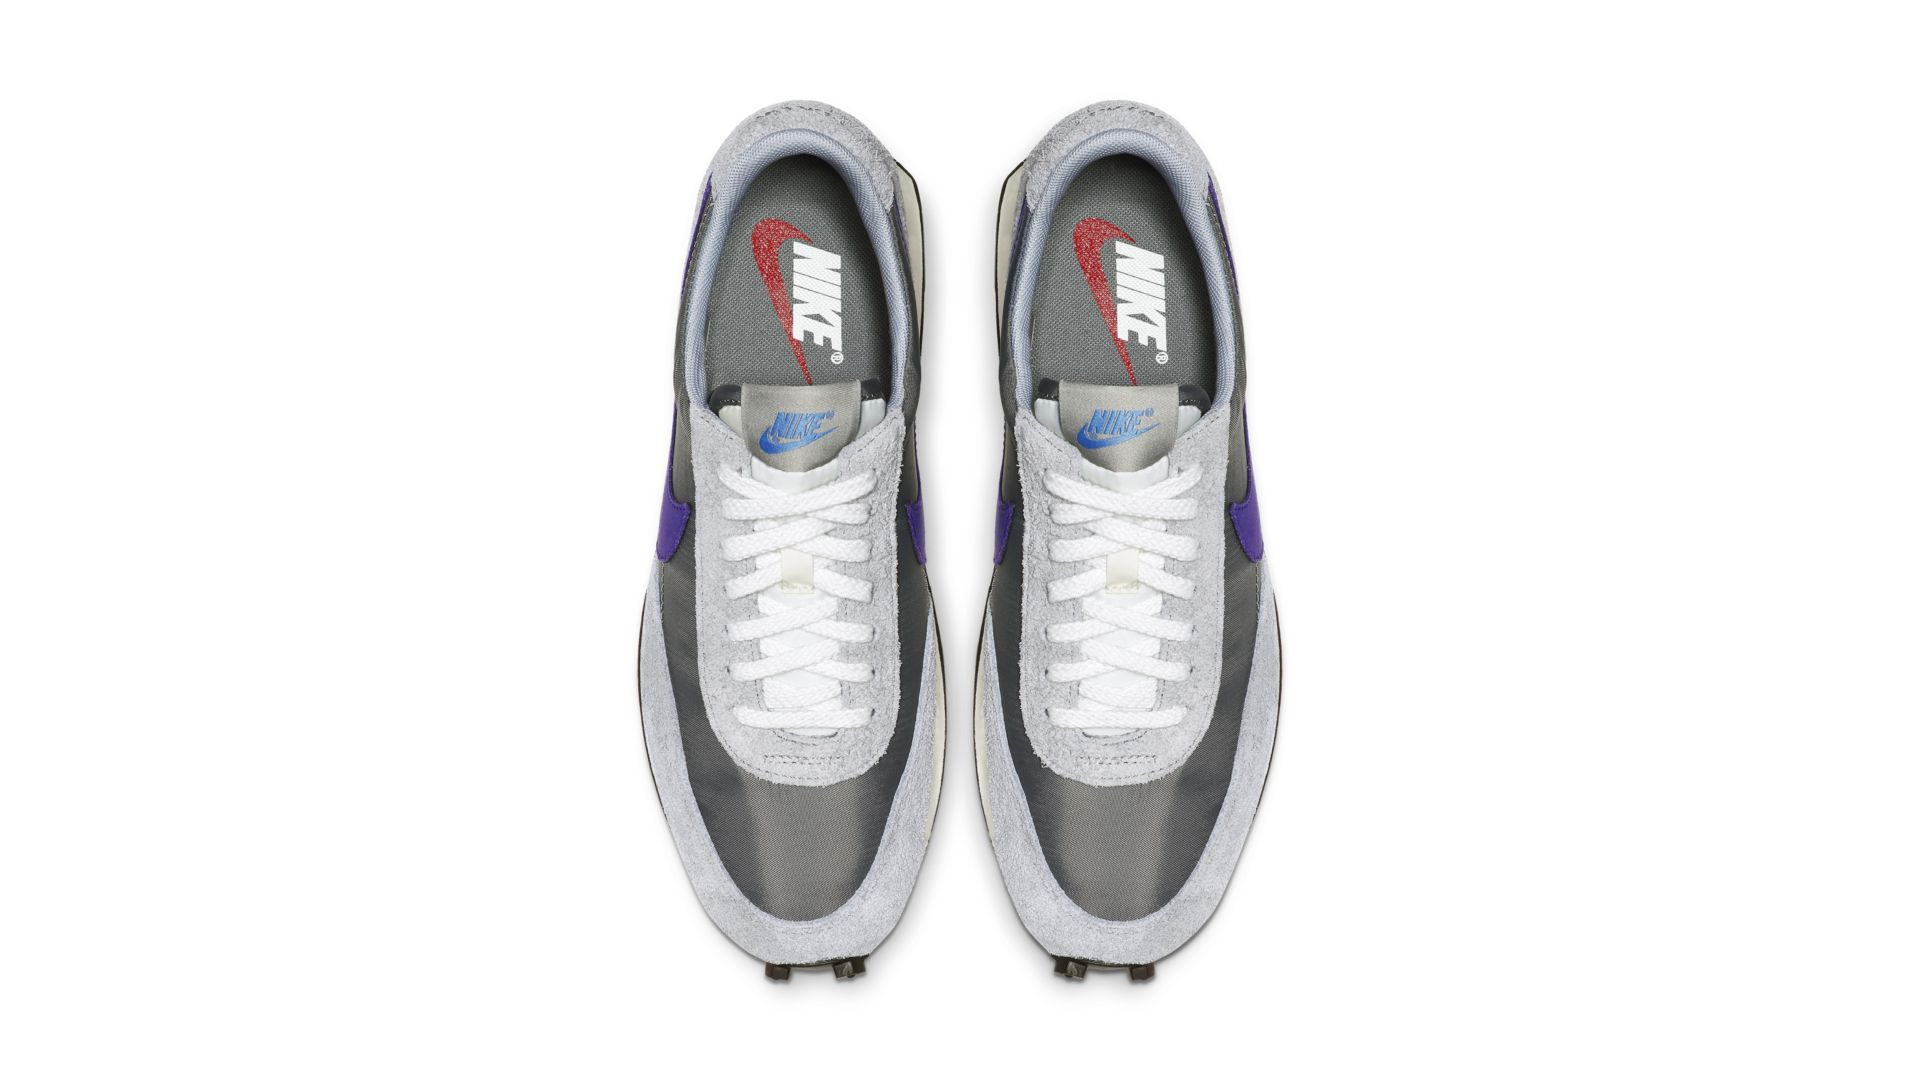 Nike Daybreak Cool Grey Hyper Grape (BV7725-001)